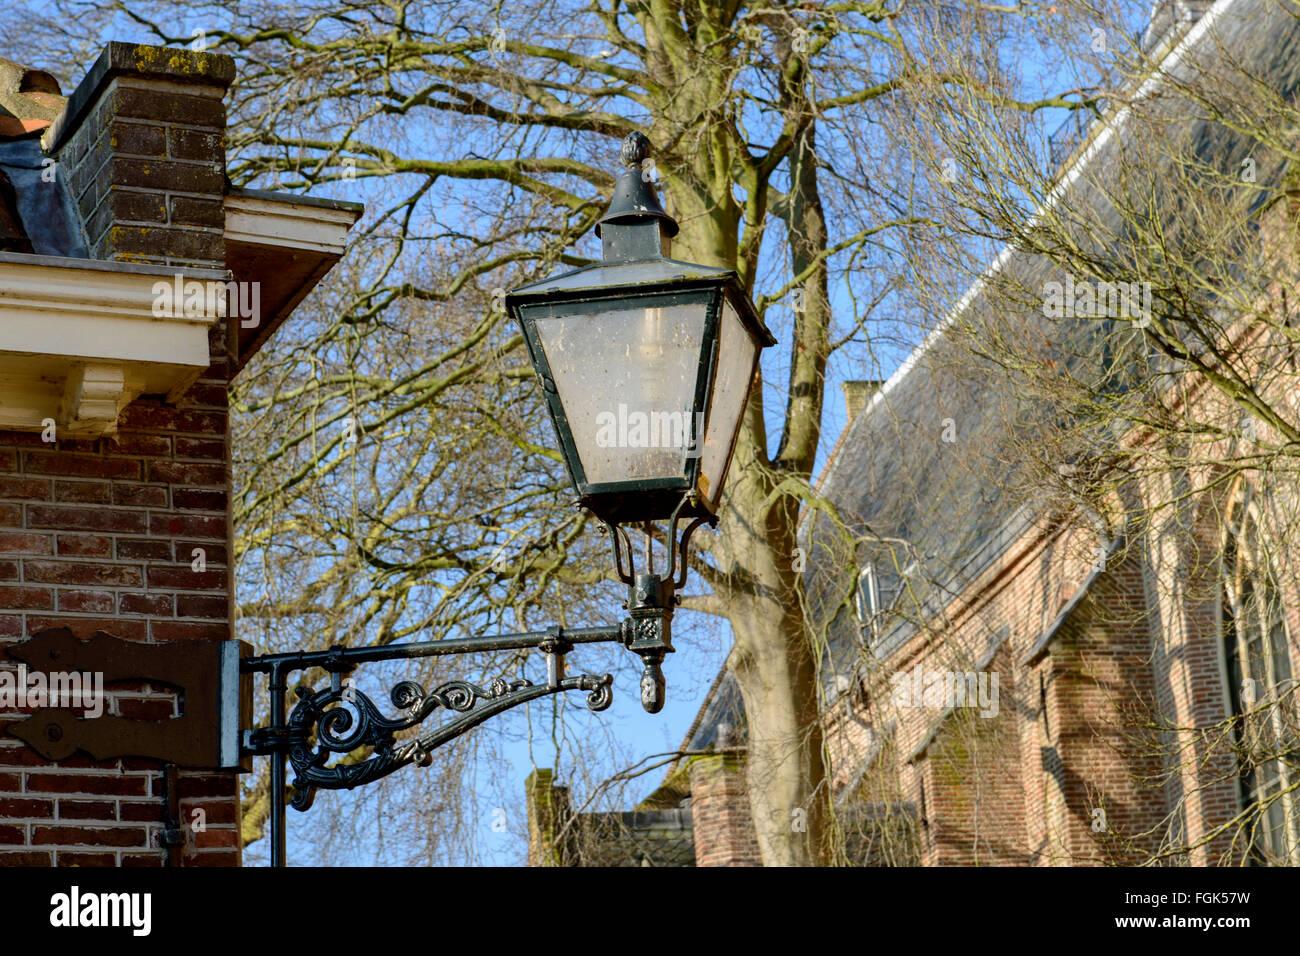 Old style street light, Edam, Netherlands - Stock Image